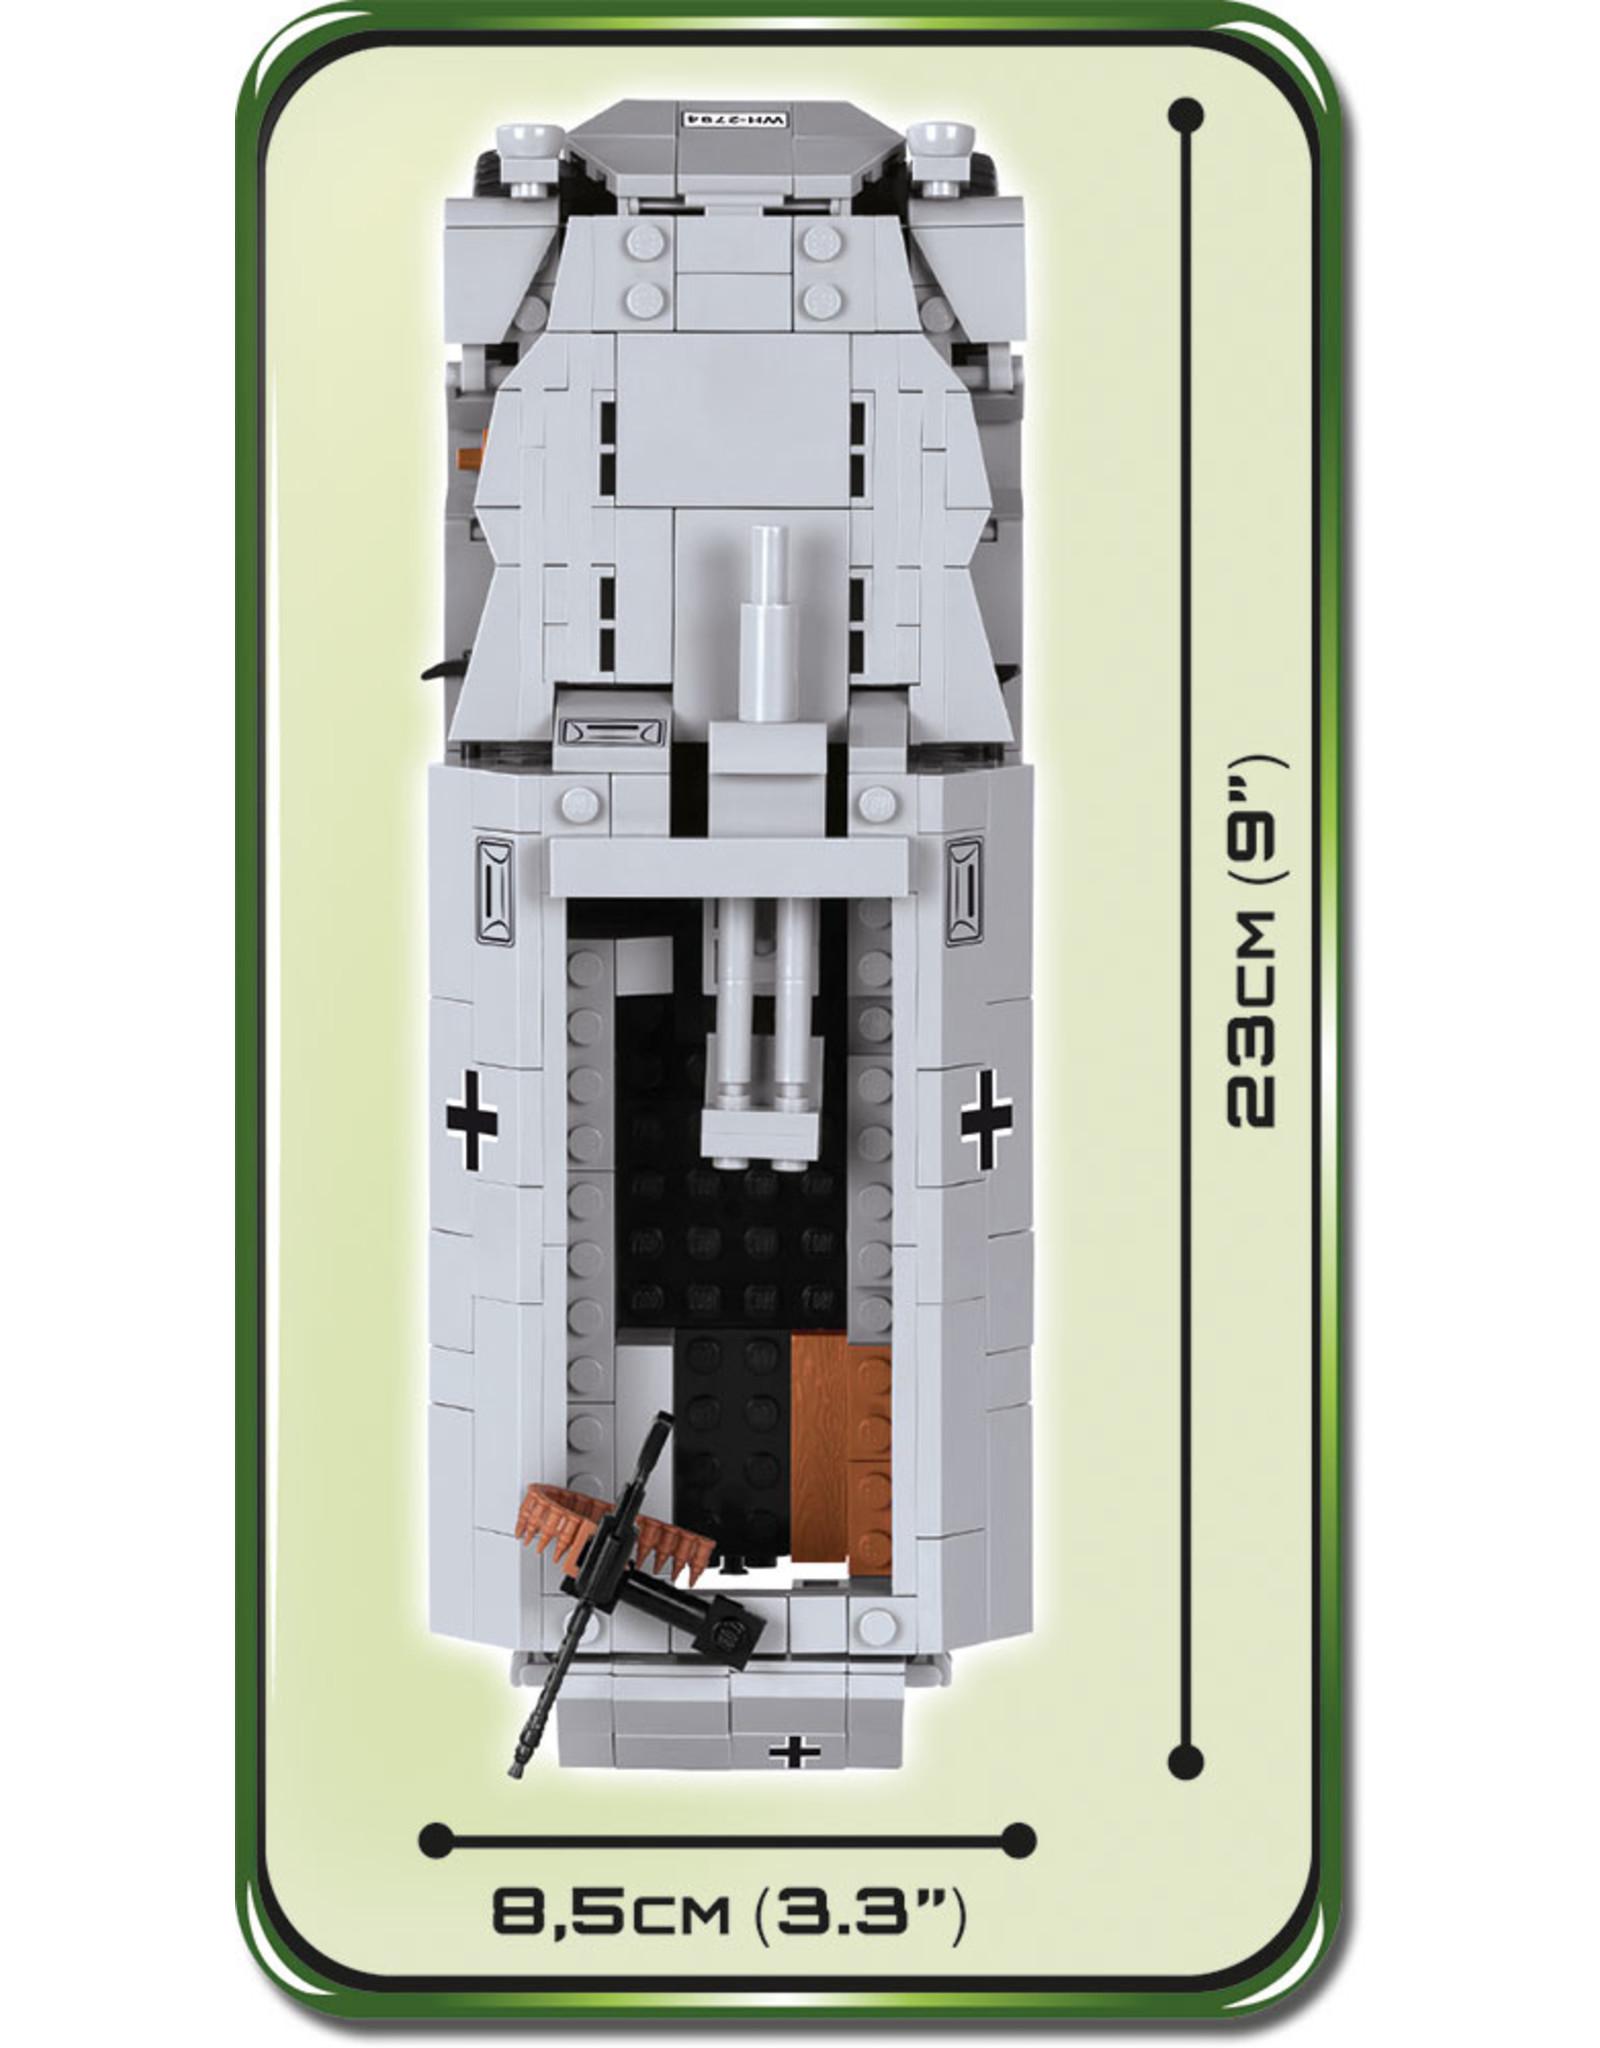 COBI COBI  WW2 2472A - Sd.Kfz. 251-9 Ausf. C Stummel